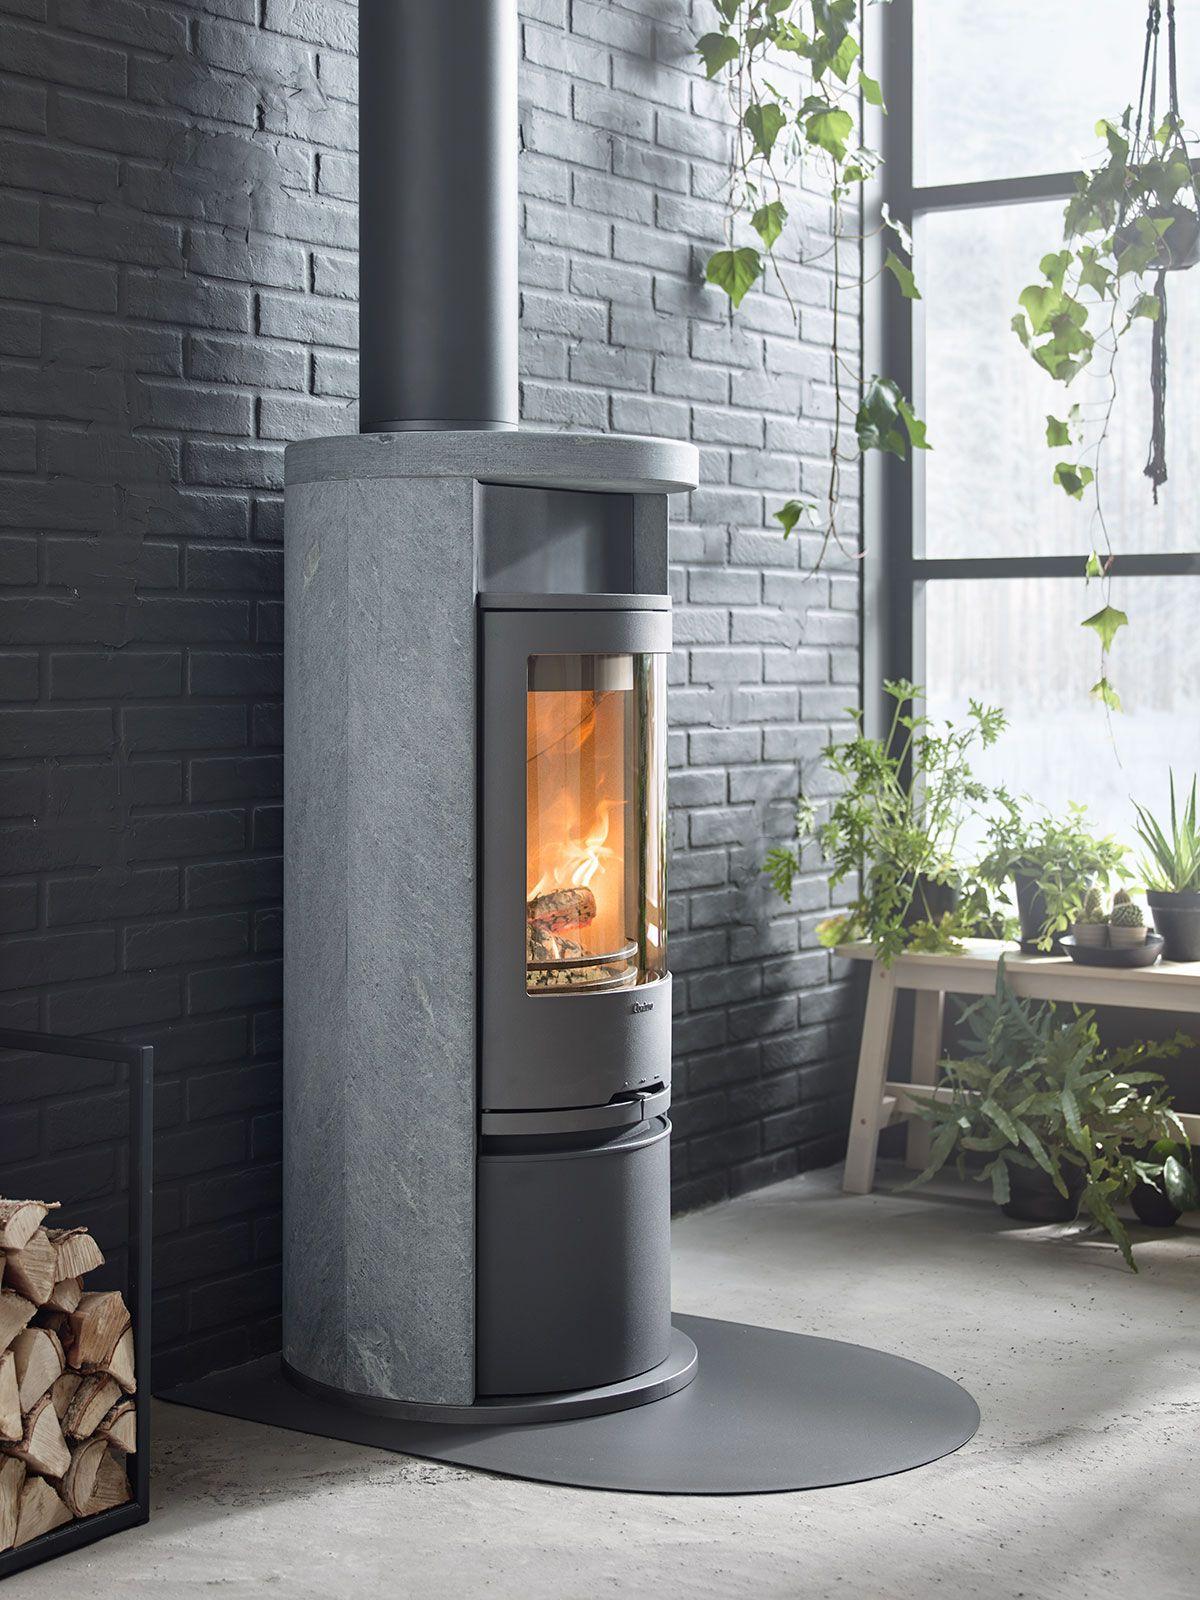 contura 620t has a surround in heat retaining soapstone the model